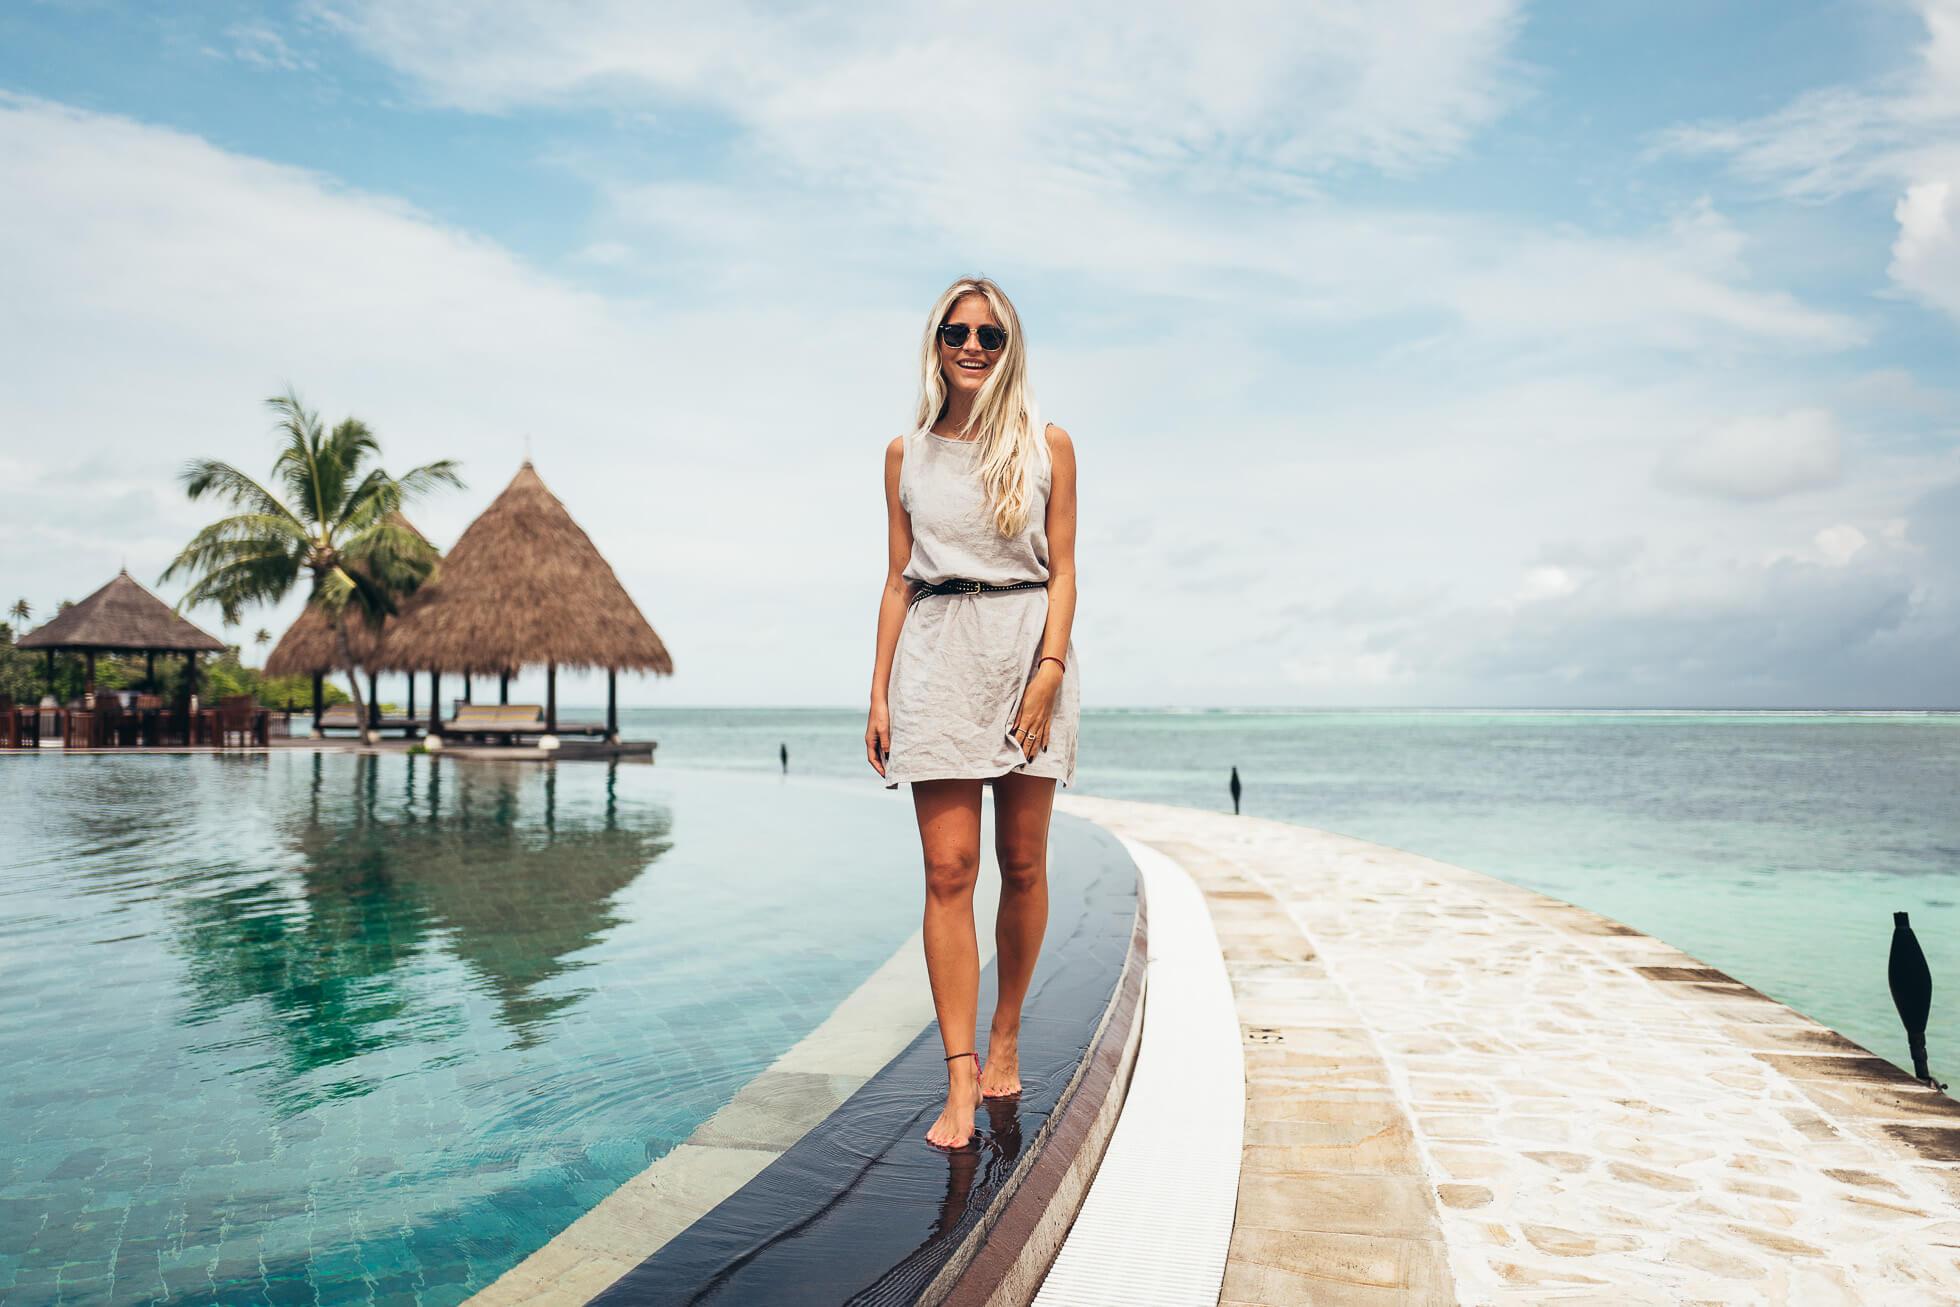 janni-deler-four-seasons-resort-maldivesl1140453